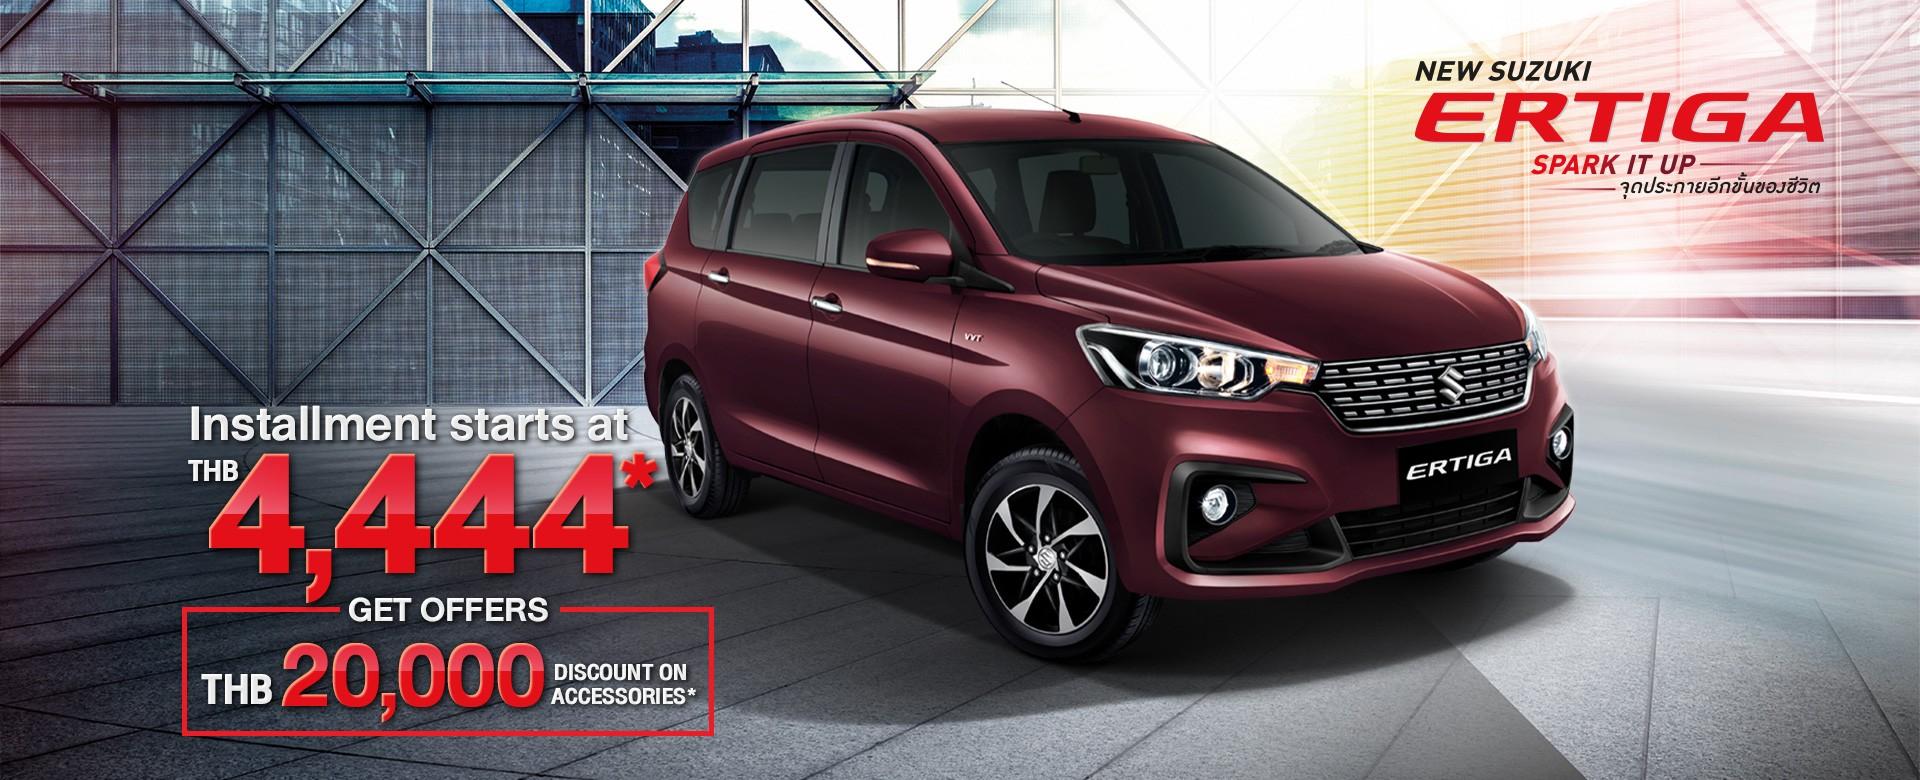 Suzuki ERTIGA Promotion